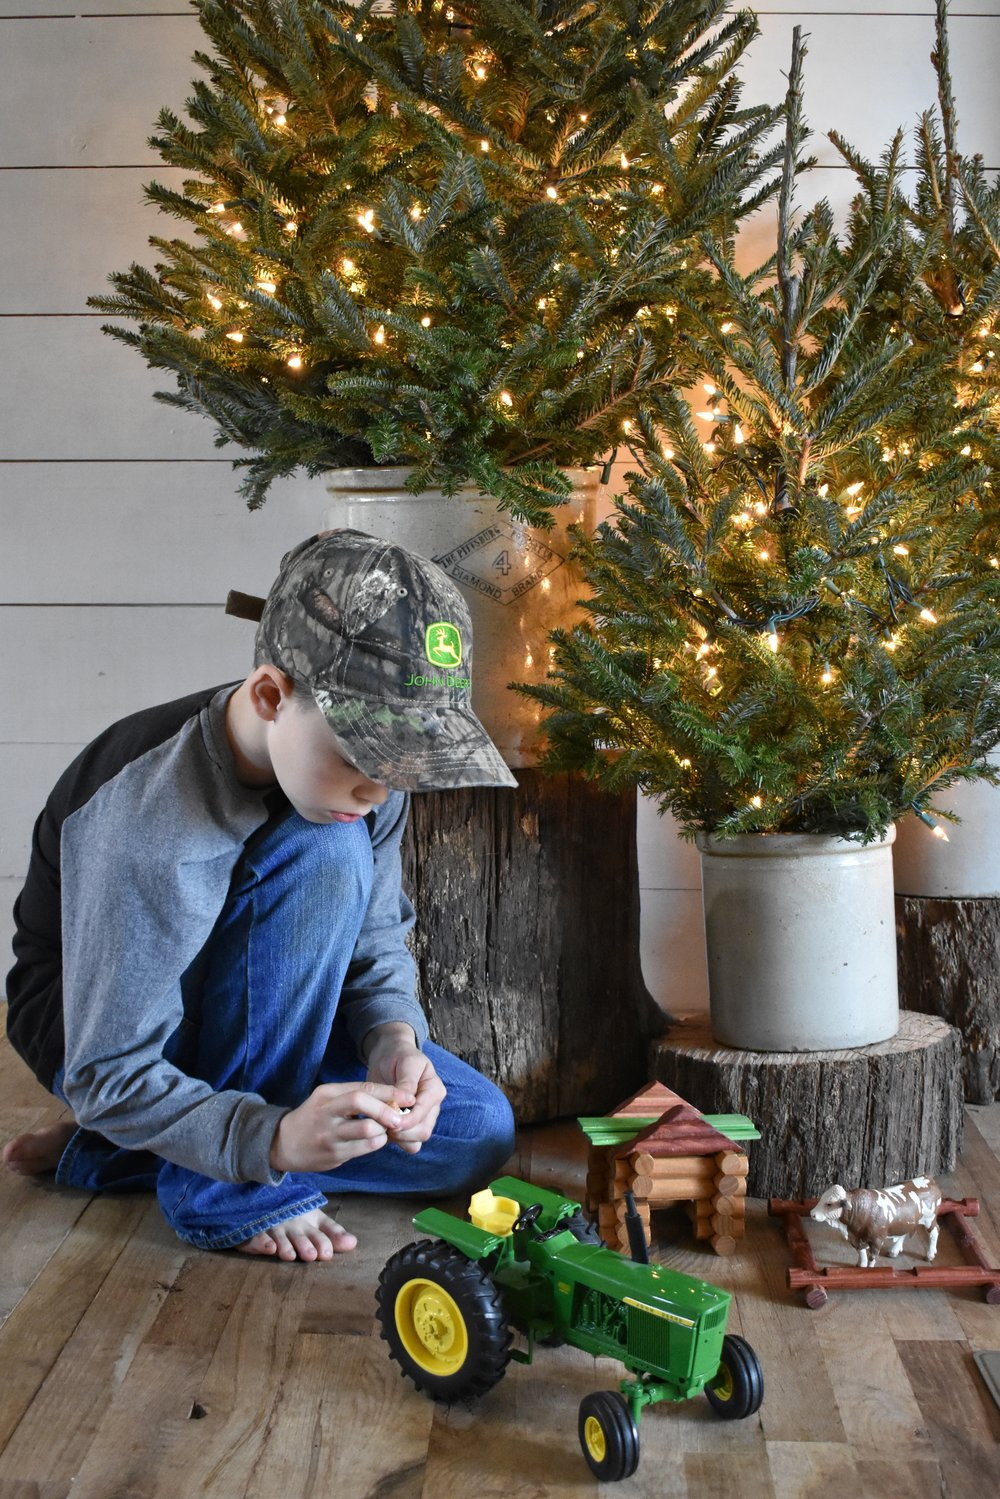 John Deere Holiday Gift Guide